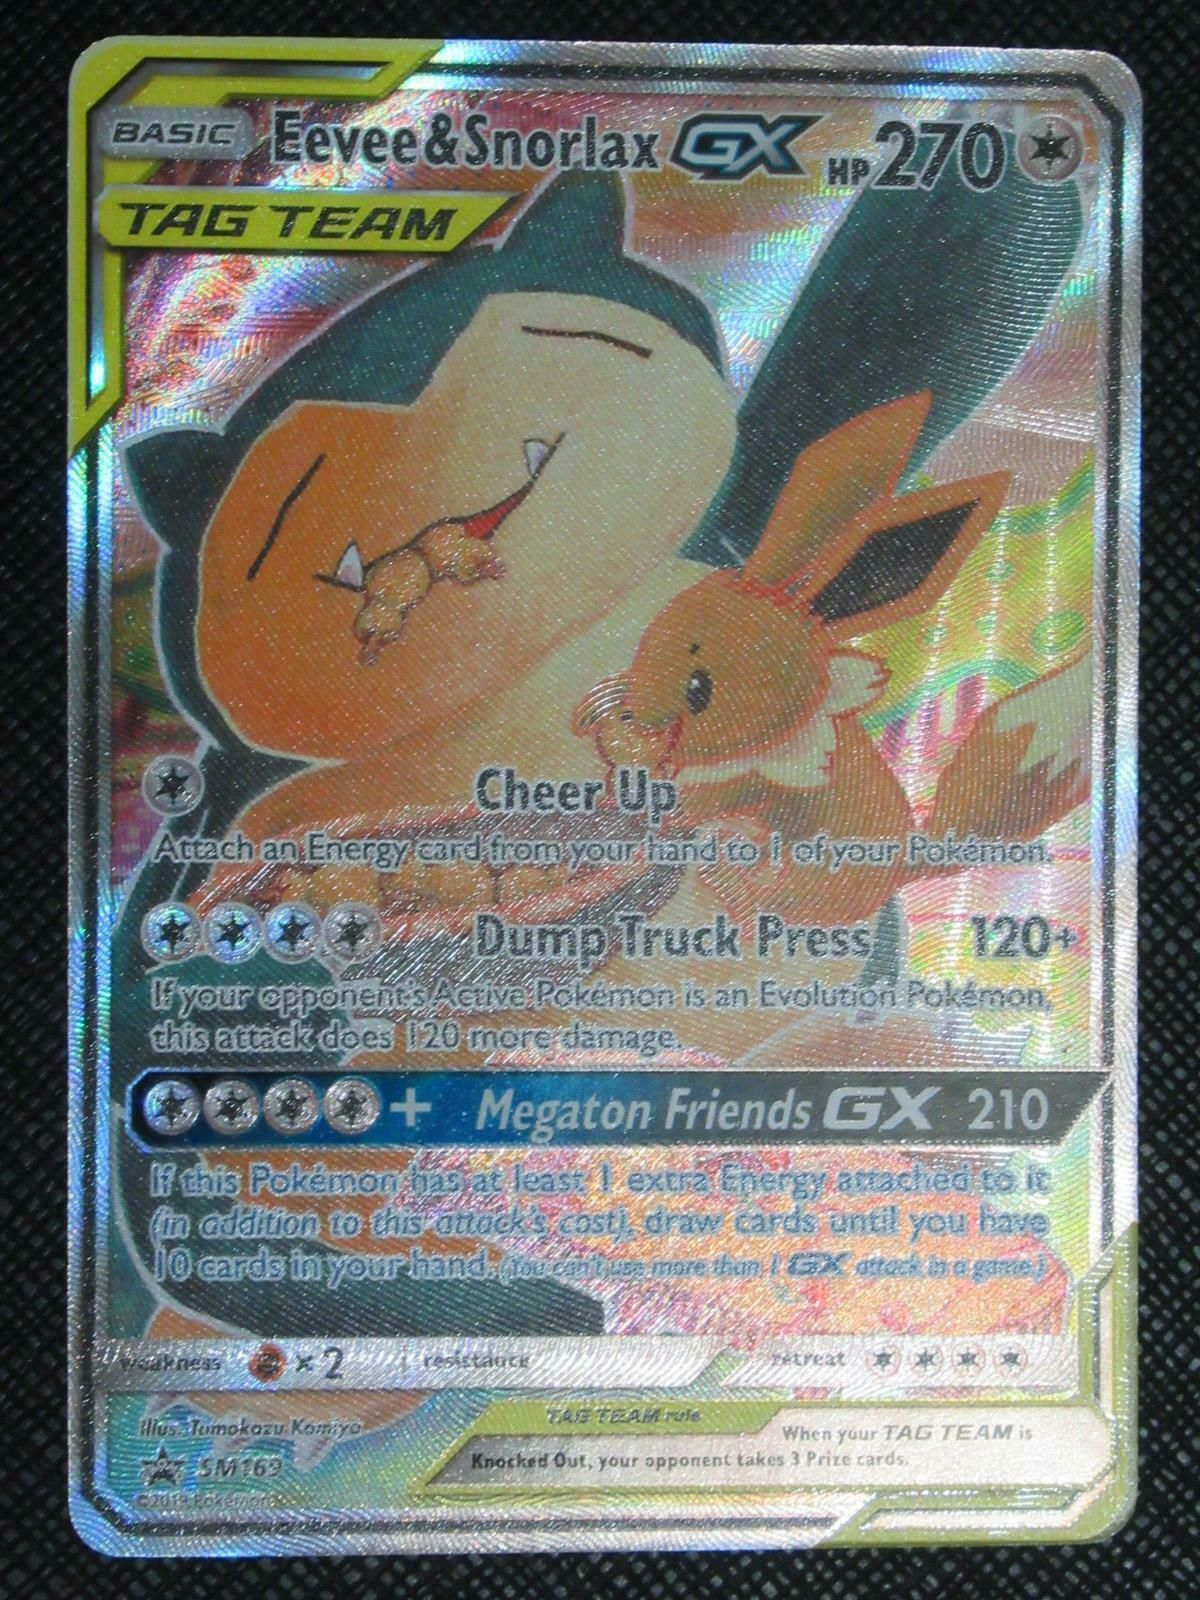 NM 1 Pokémon Snorlax Card Black Star From Promo Series